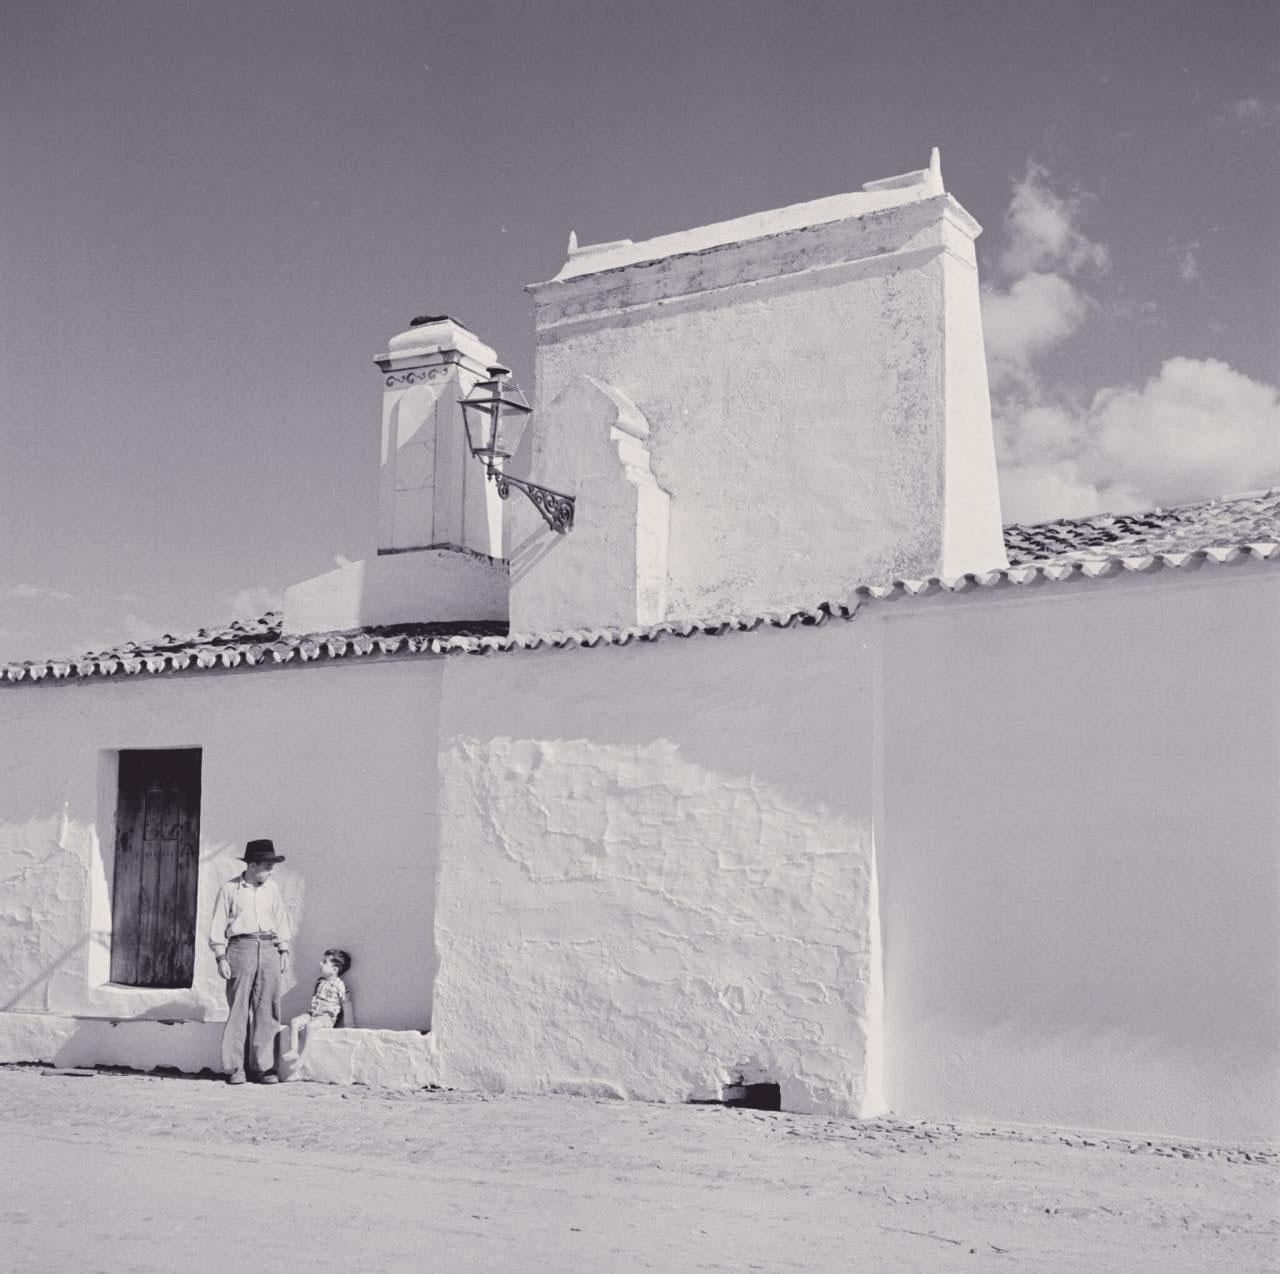 Habitações alentejanas séc. XX  (Artur Pastor, s/d)